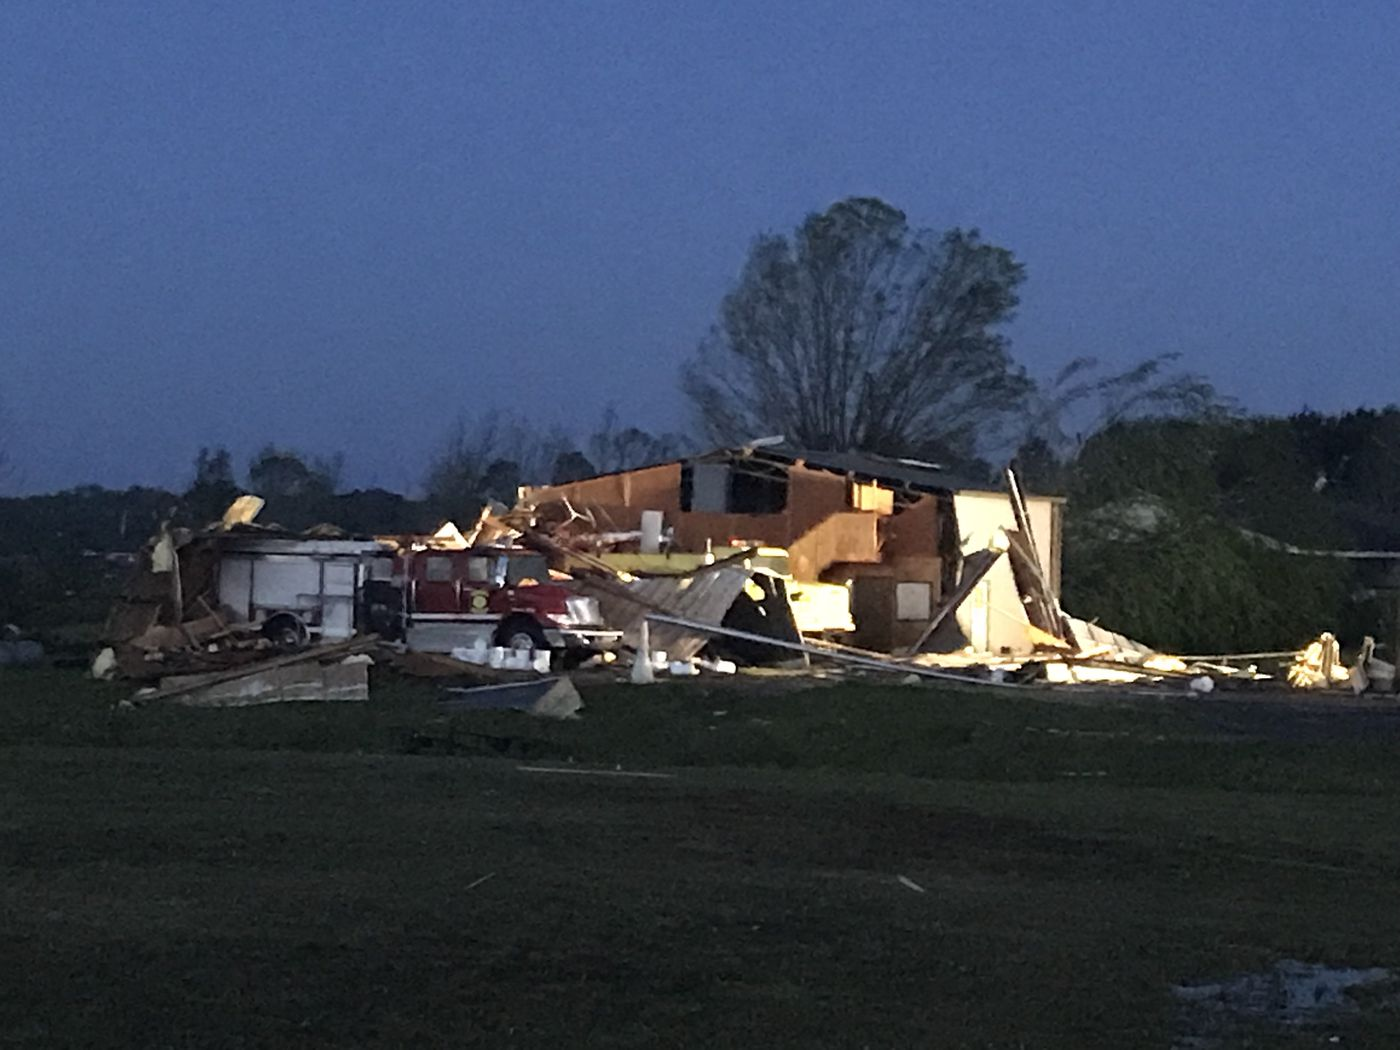 First light reveals the level of devastation in Hamilton, MS. (Source: WCBI)